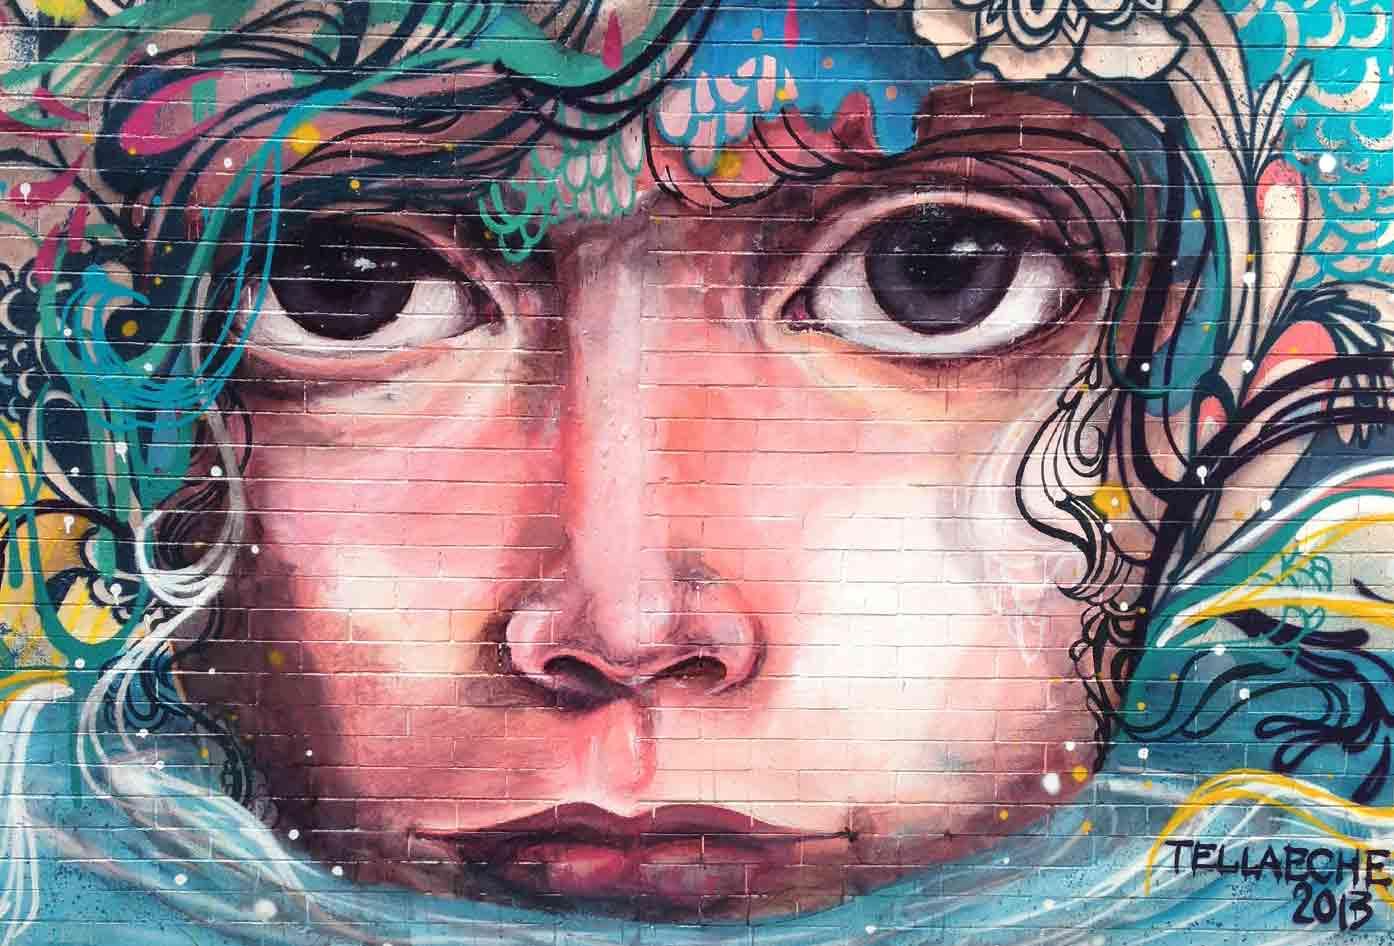 mexico street art in condensa